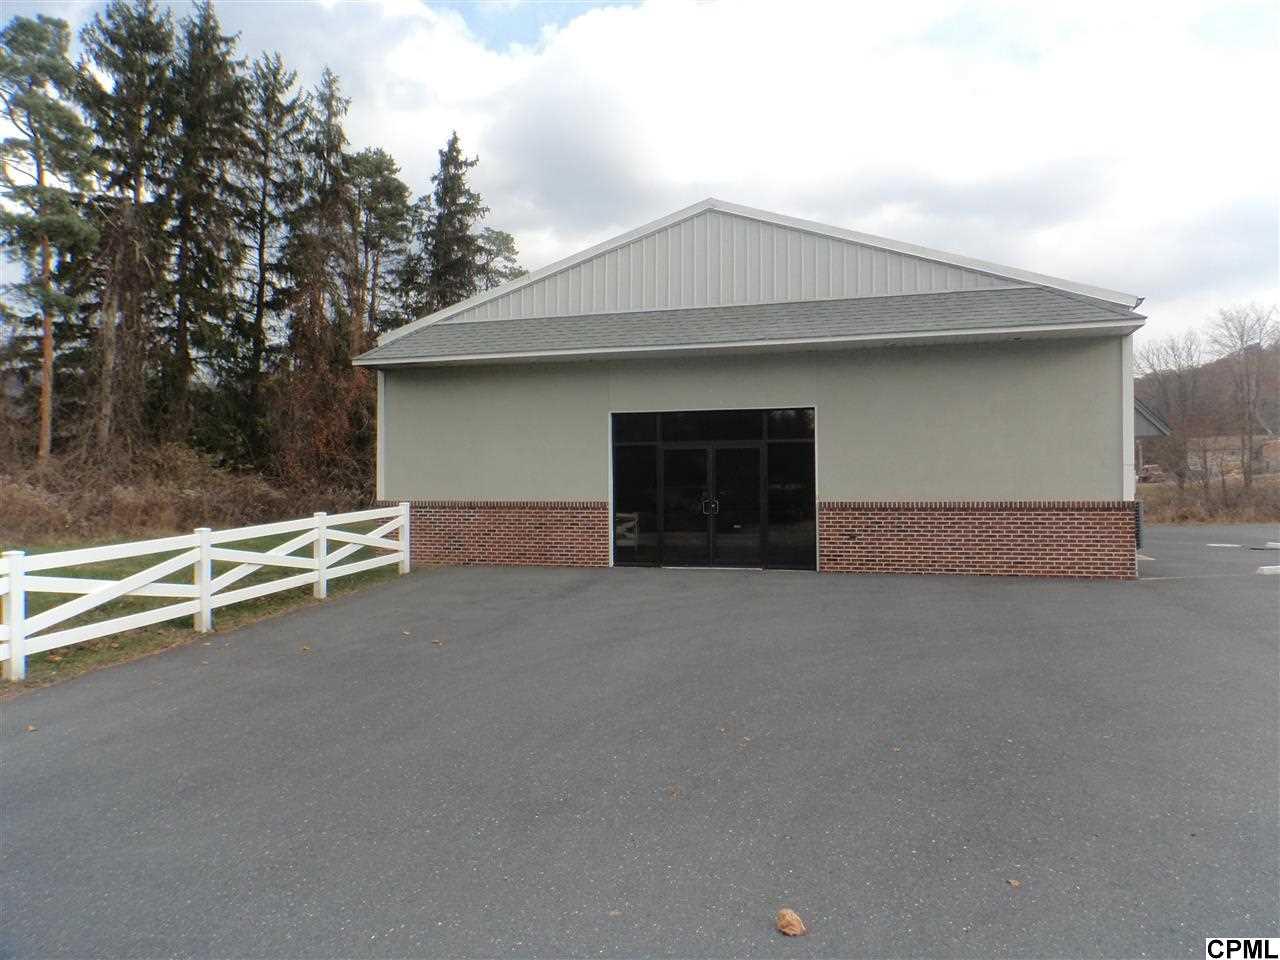 Real Estate for Sale, ListingId: 30799004, Dauphin,PA17018